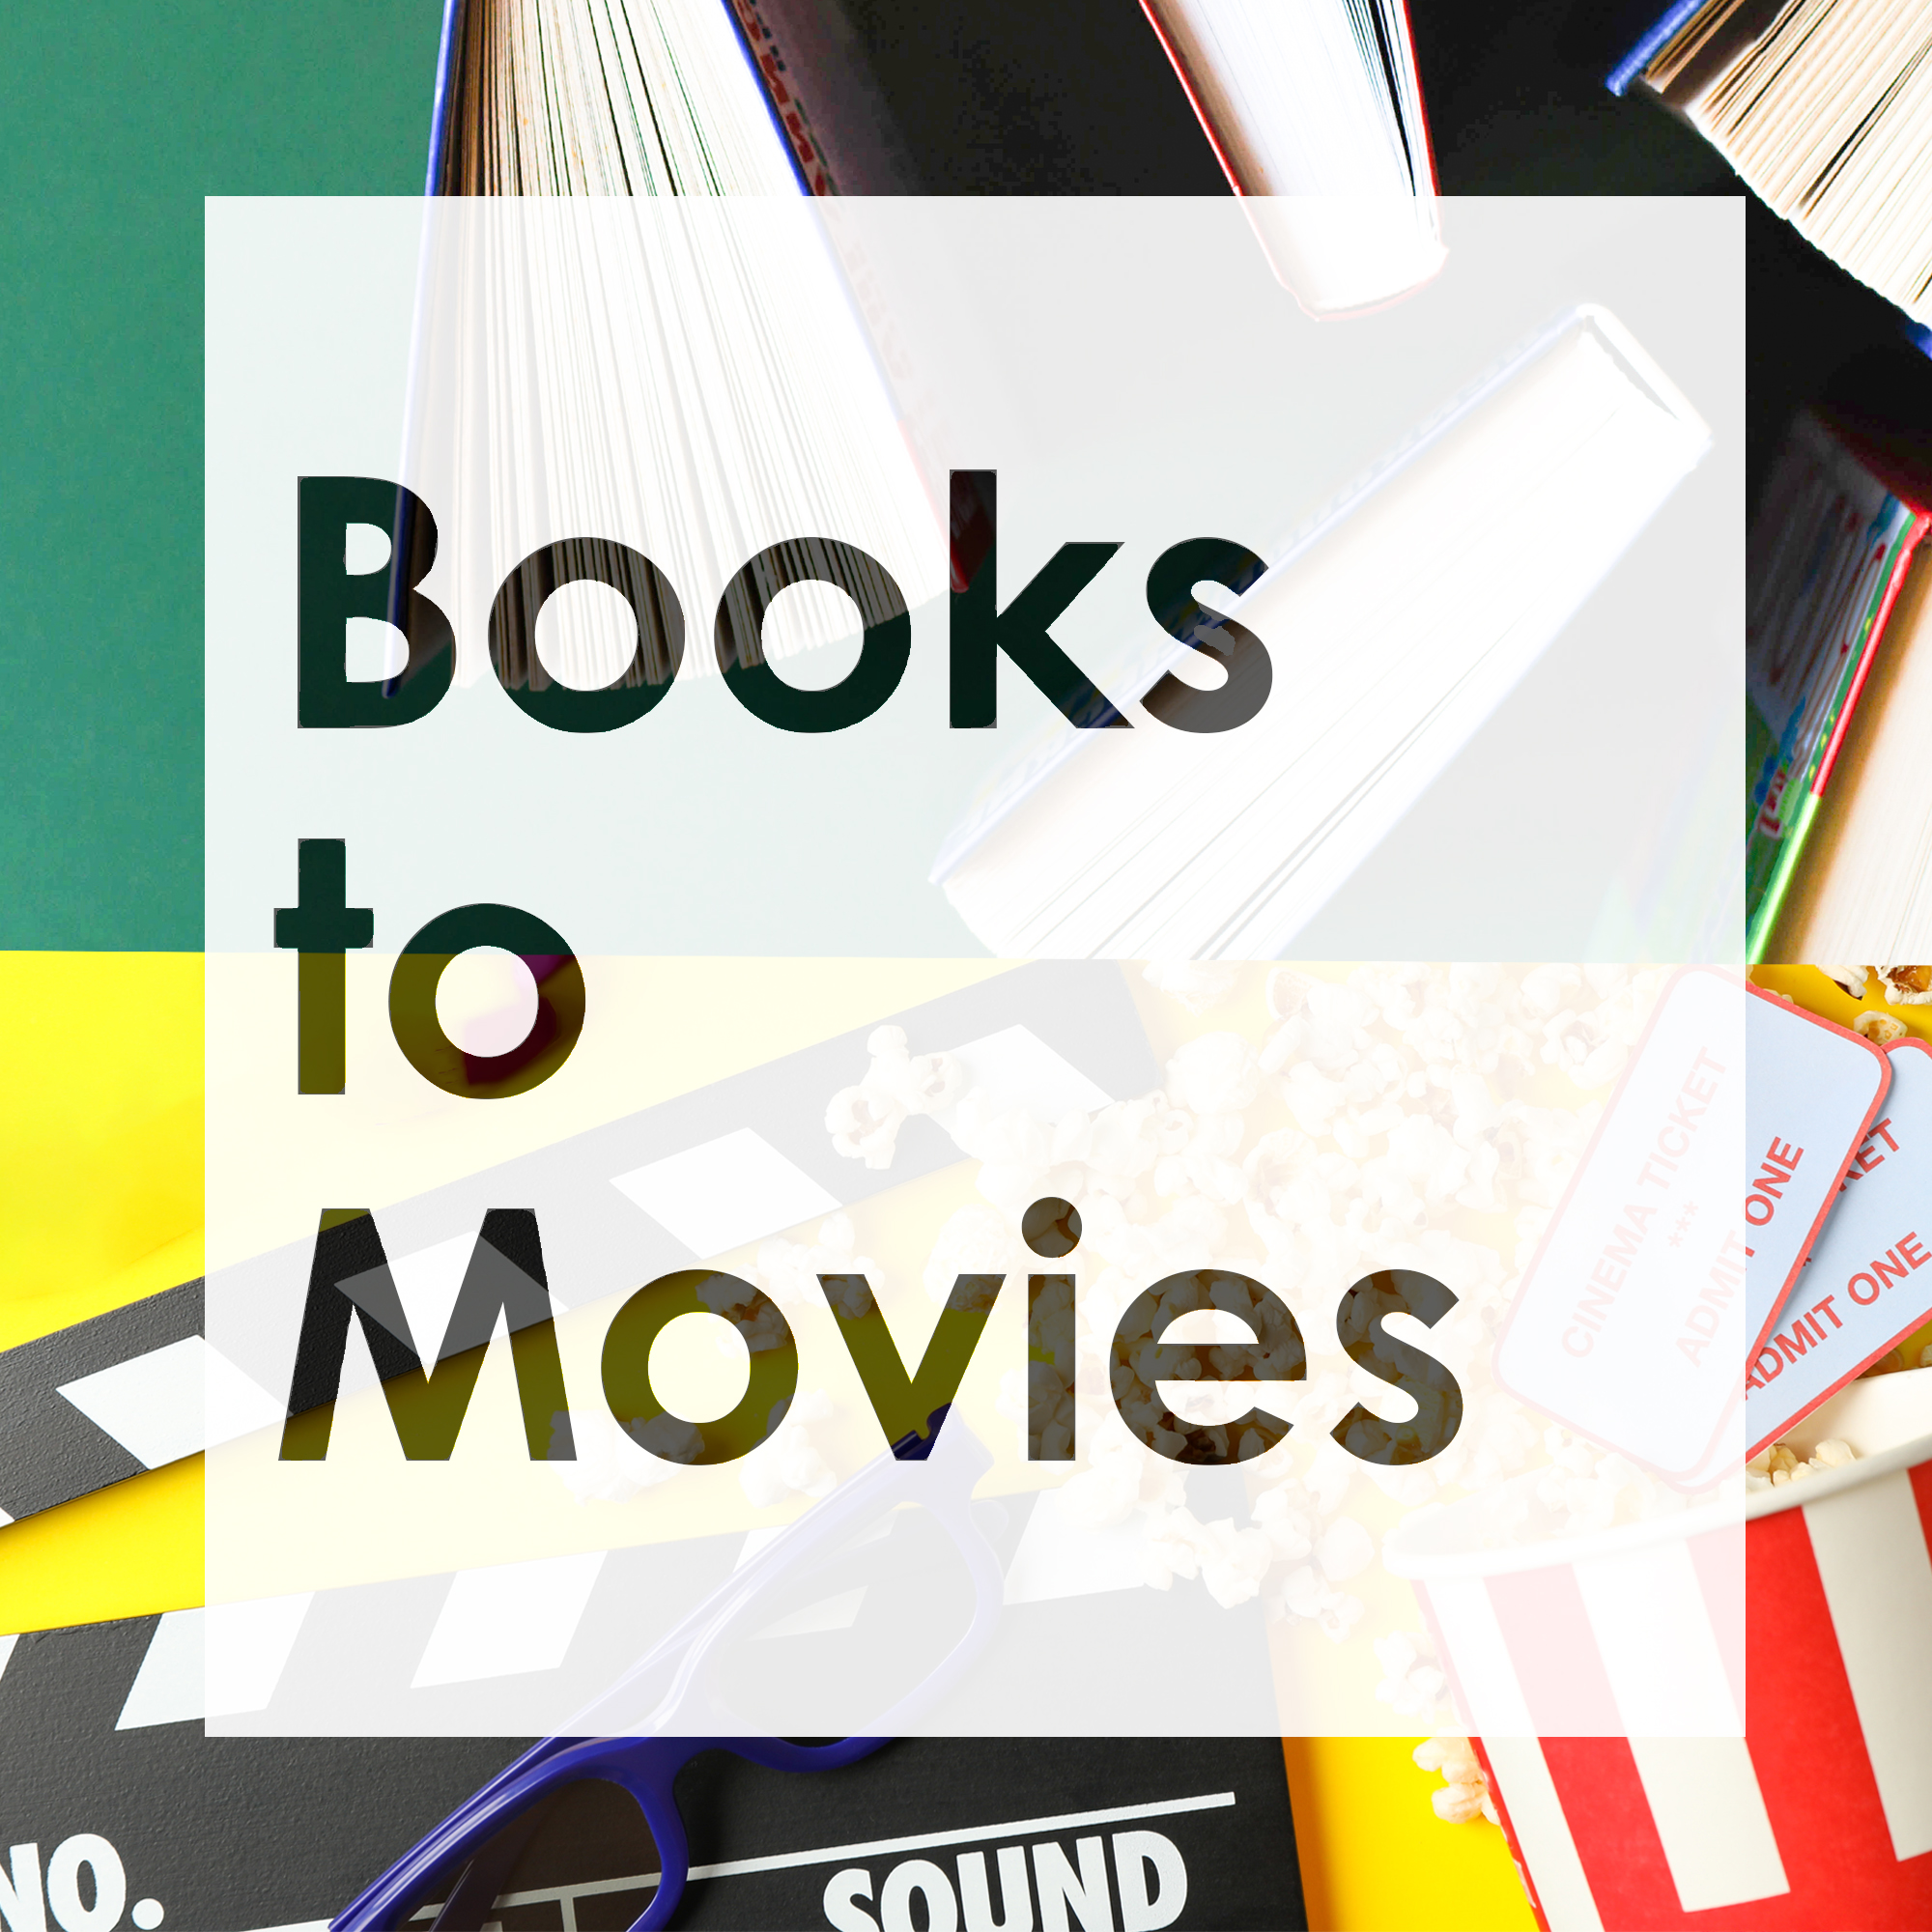 Books to Movies Club